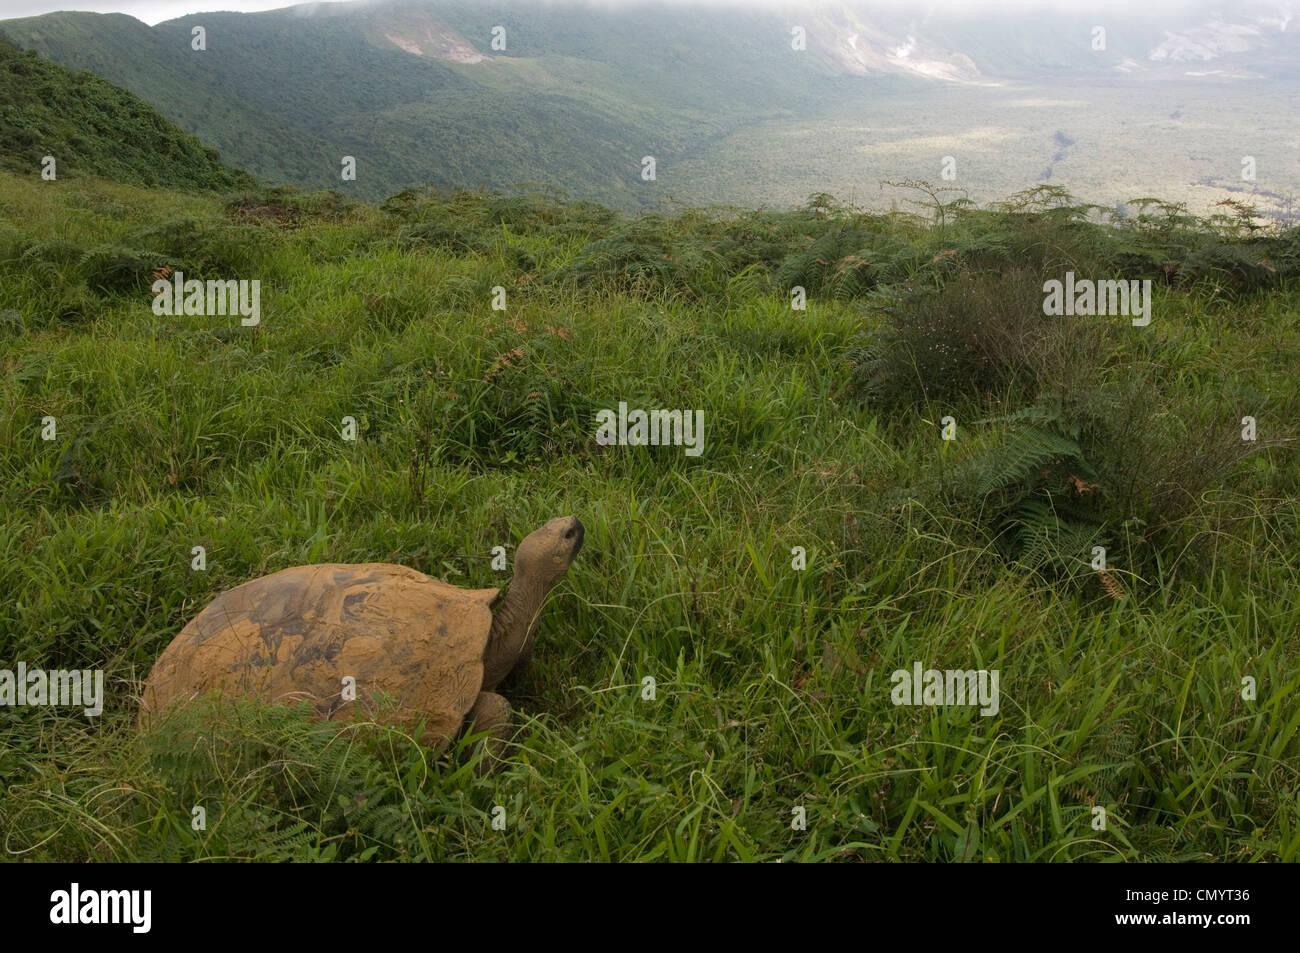 Galapagos Giant Tortoise on rim of Alcedo Volcano, Isabela Island, Galapagos Islands, Ecuador, South America. - Stock Image